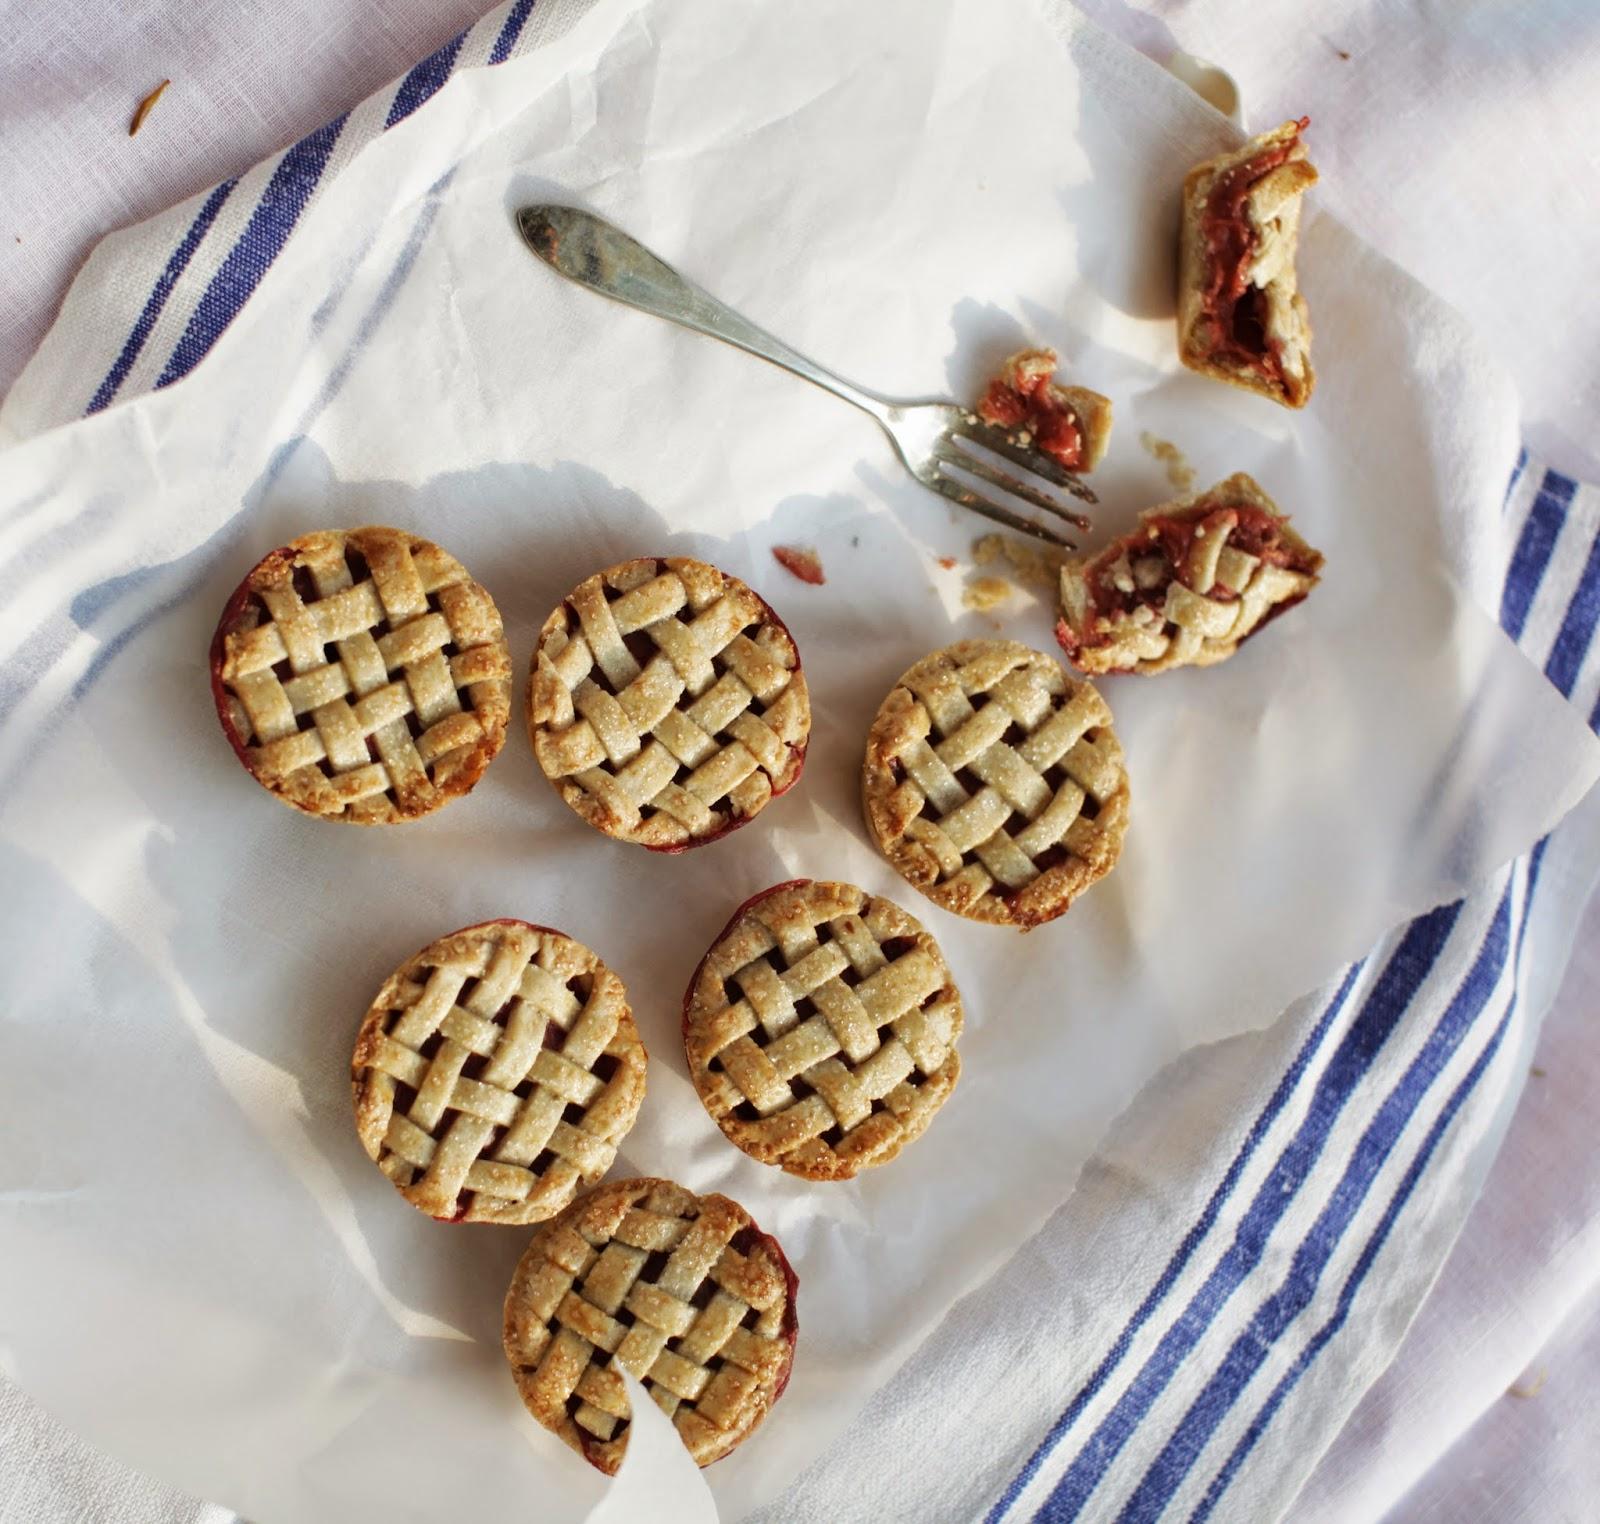 http://our-favorite-apple-pie.blogspot.com/2014/06/babeczki-rabarbarowo-truskawkowe.html